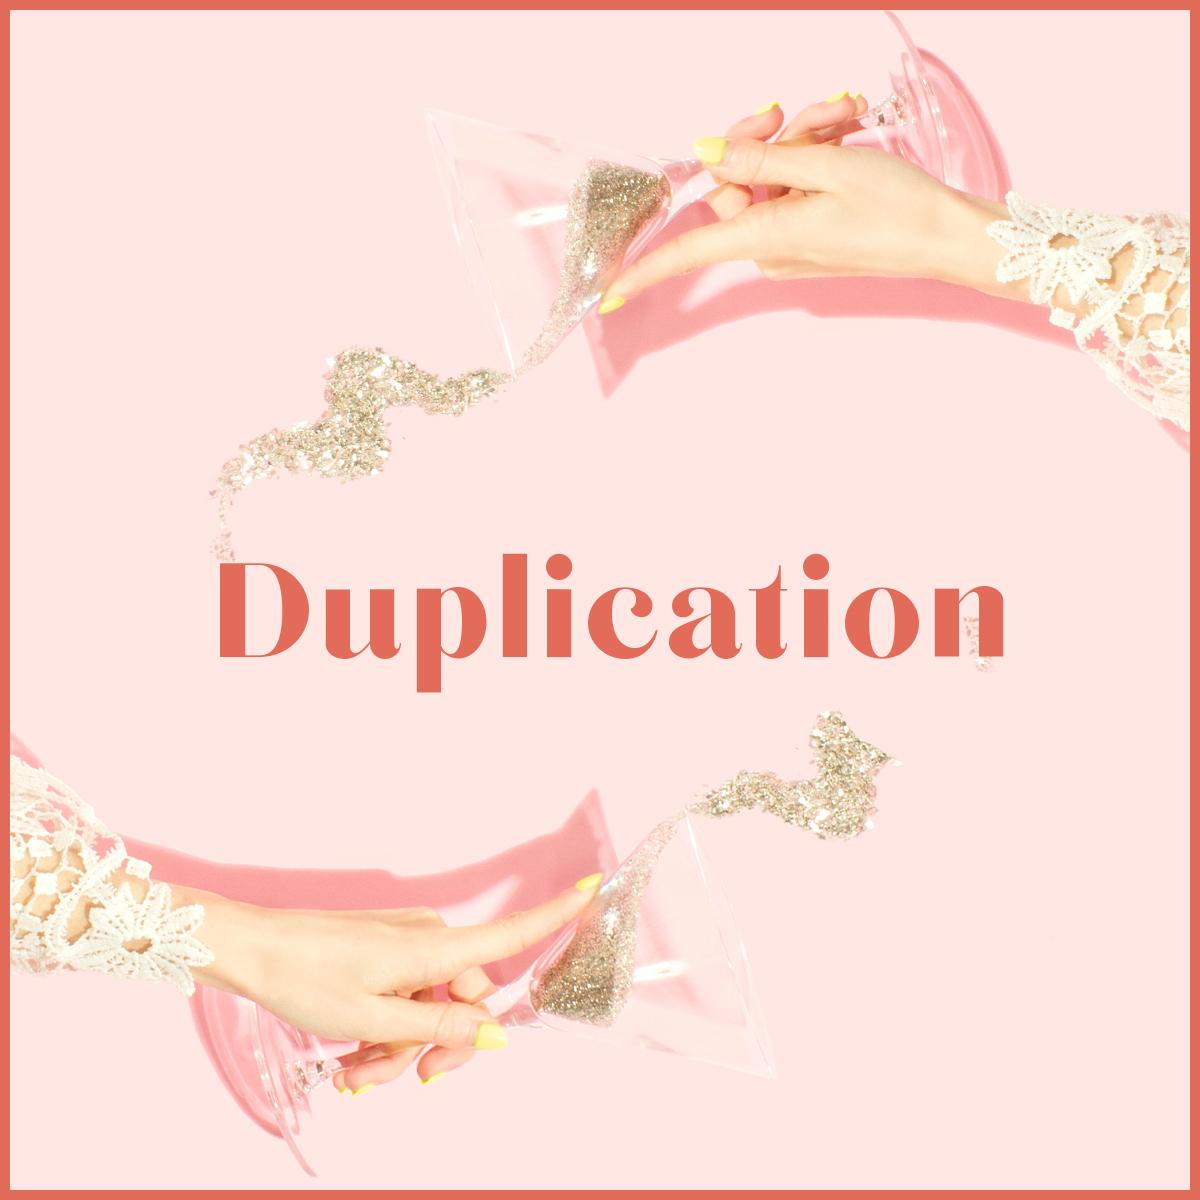 Duplication.jpg